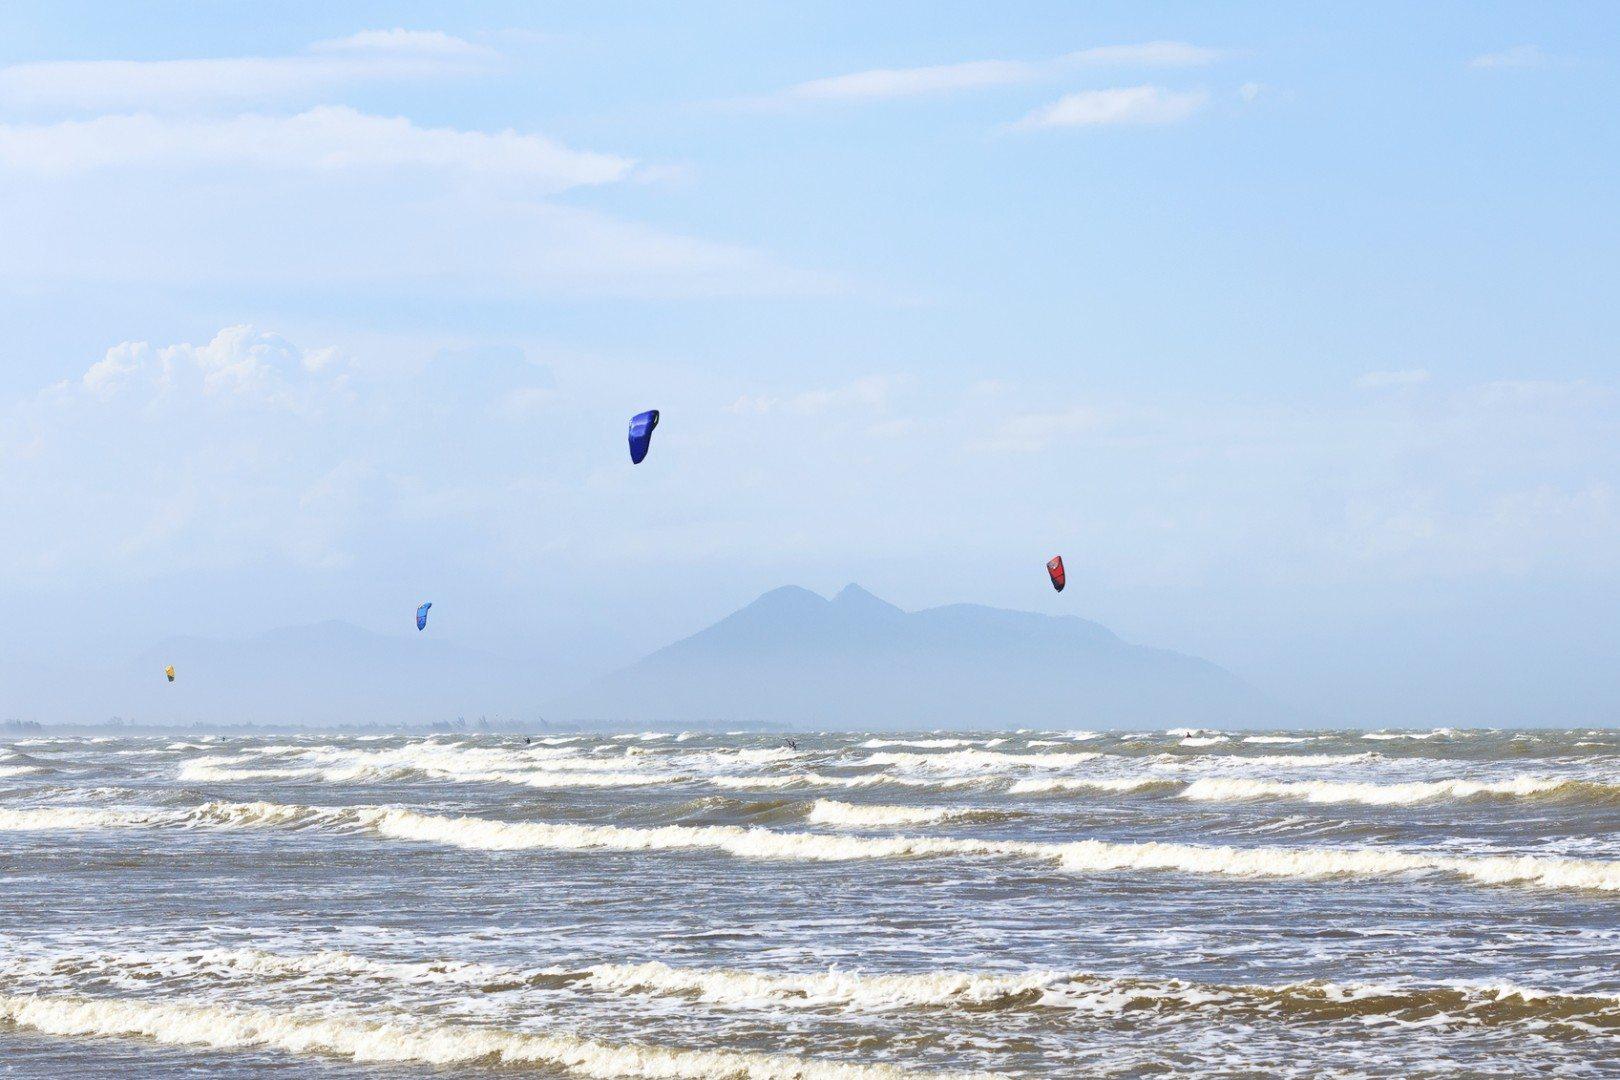 Kitesurfing-on-beach-Rasa-in-Armacao-dos-Buzios-Brazil-000053055170_Medium